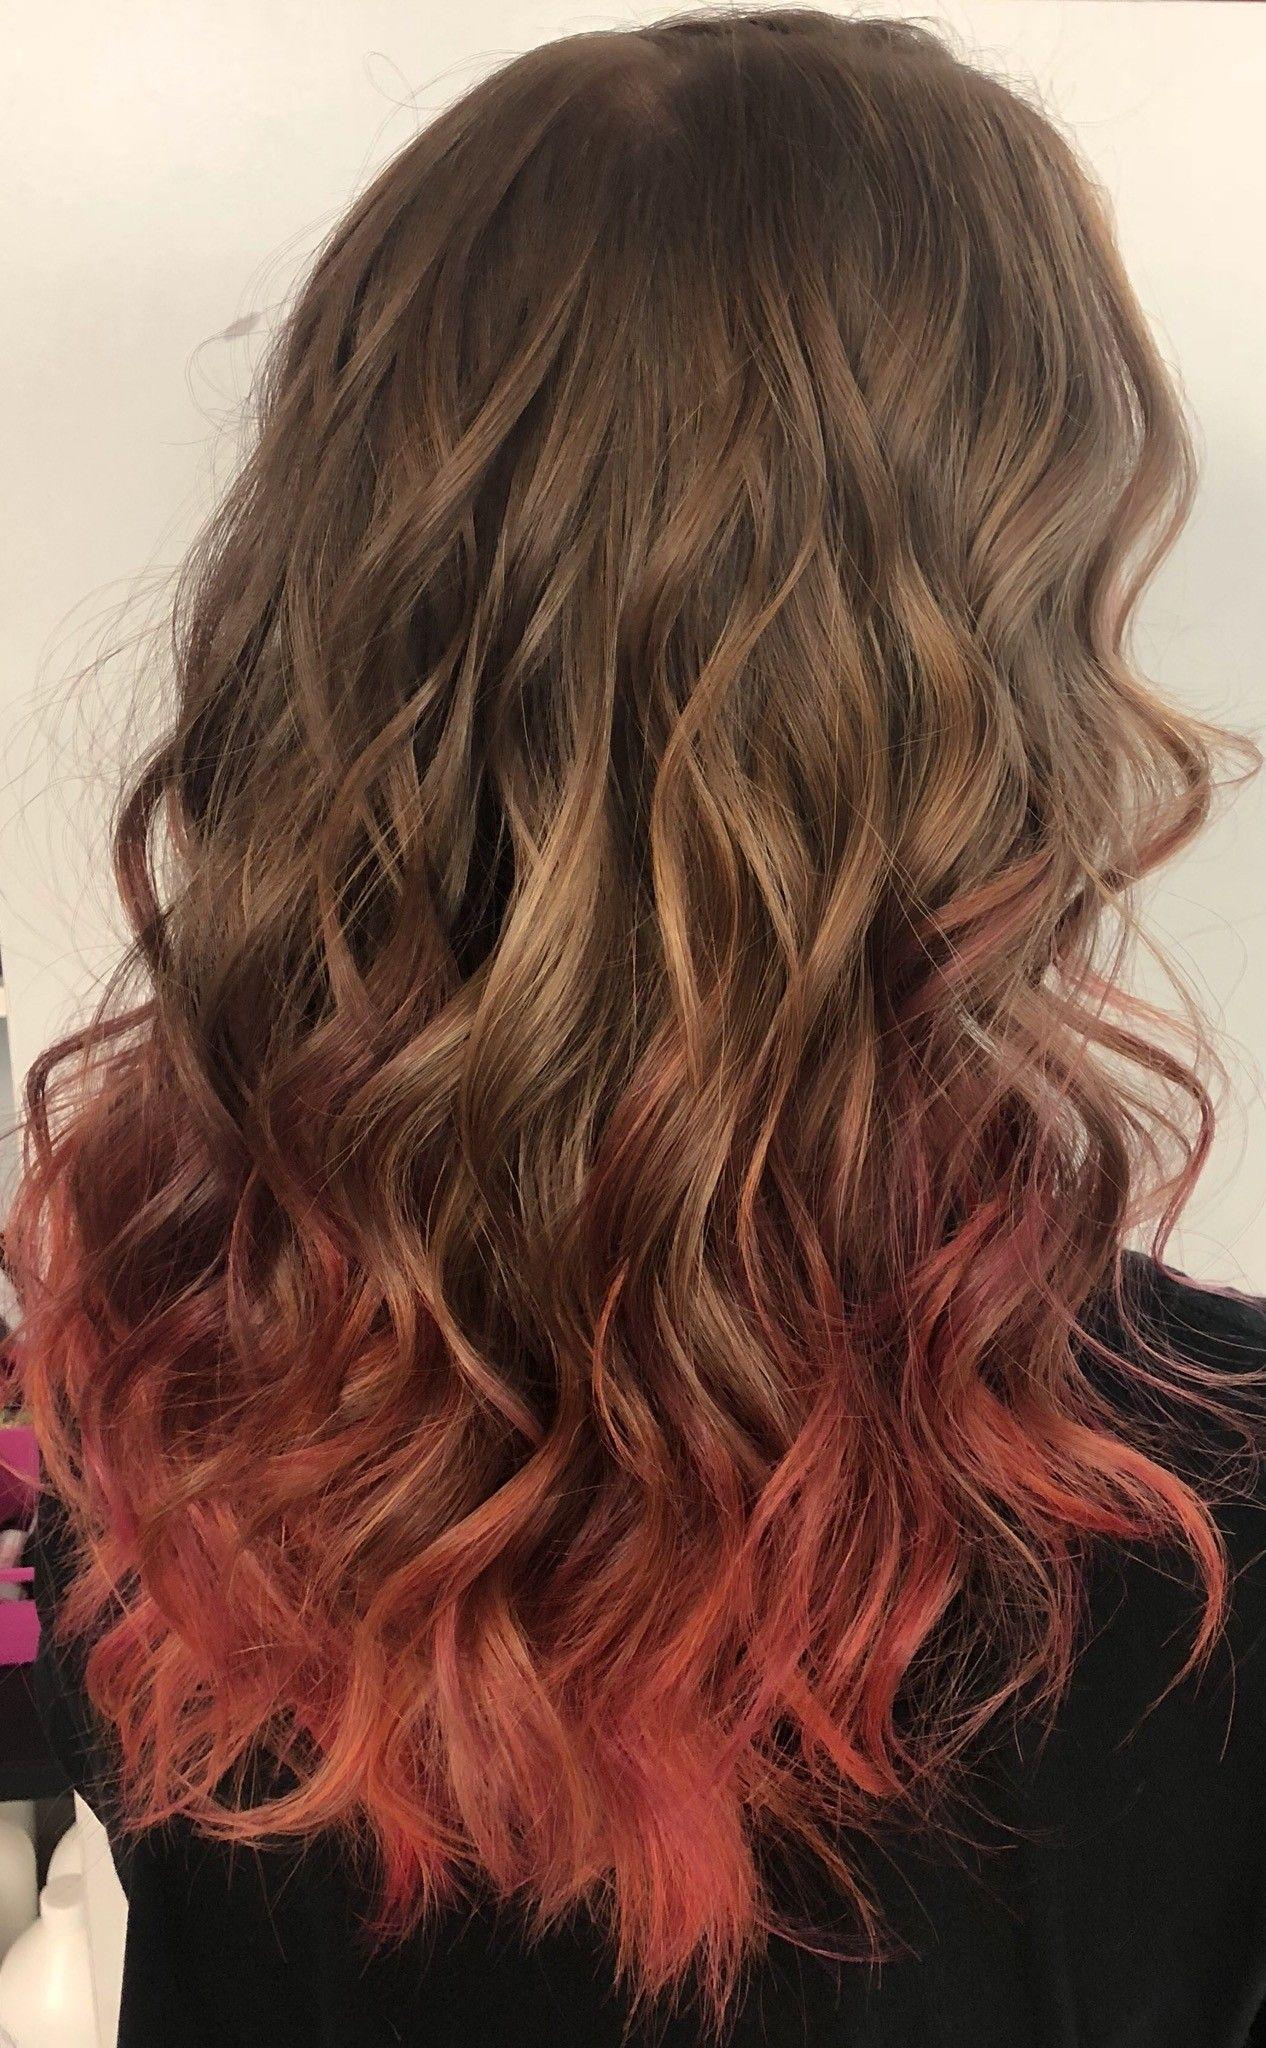 Natural Red Hair With Fashion Colors Natural Red Hair Hair Orange Hair